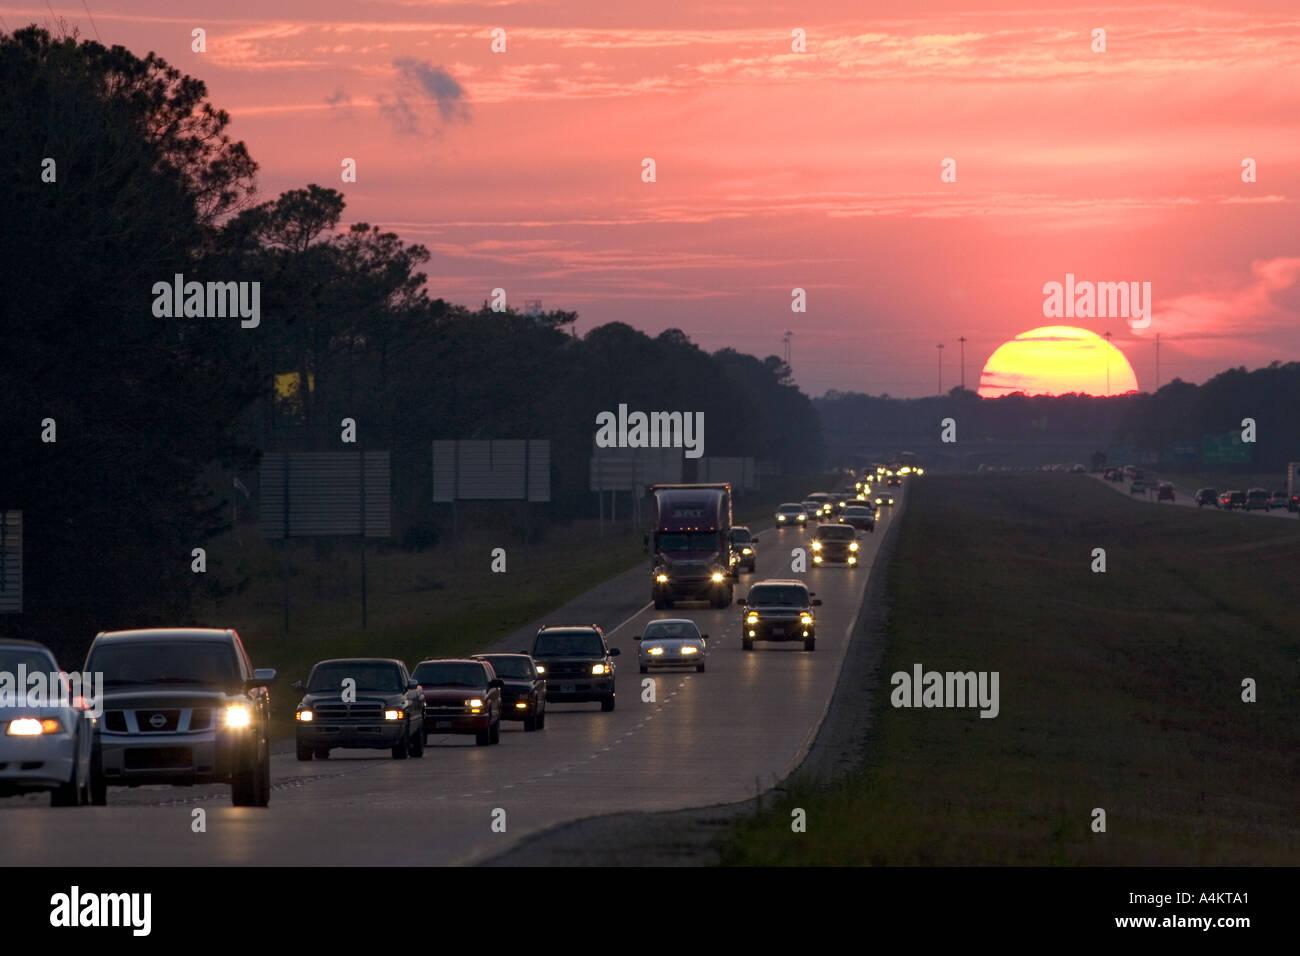 Traffic at sunset on Interstate 10 near Biloxi Mississippi